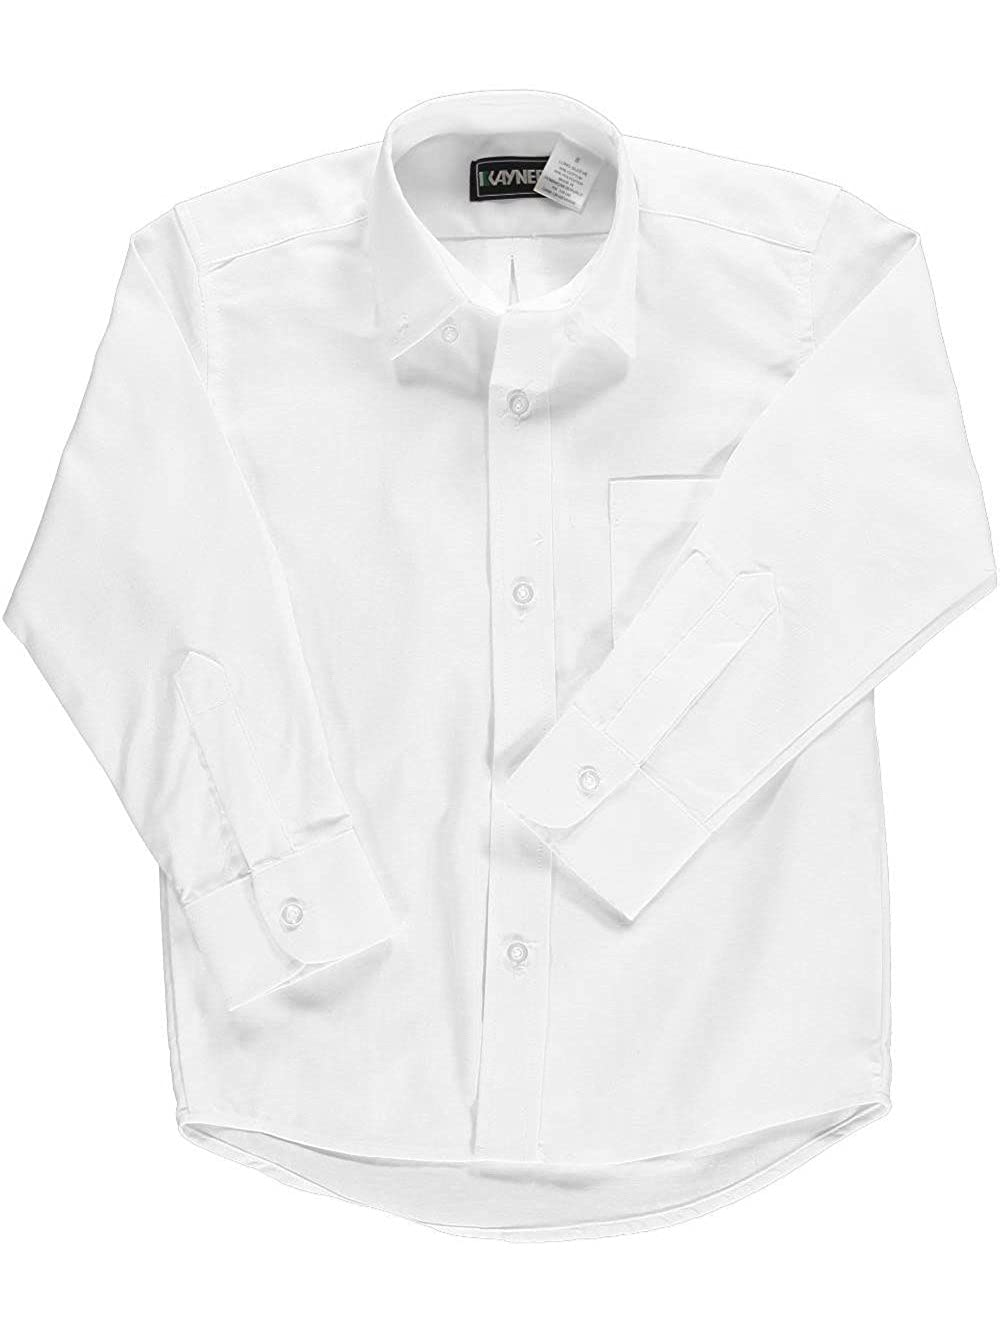 8 white Rifle Kaynee Unisex L//S Button-Down Shirt